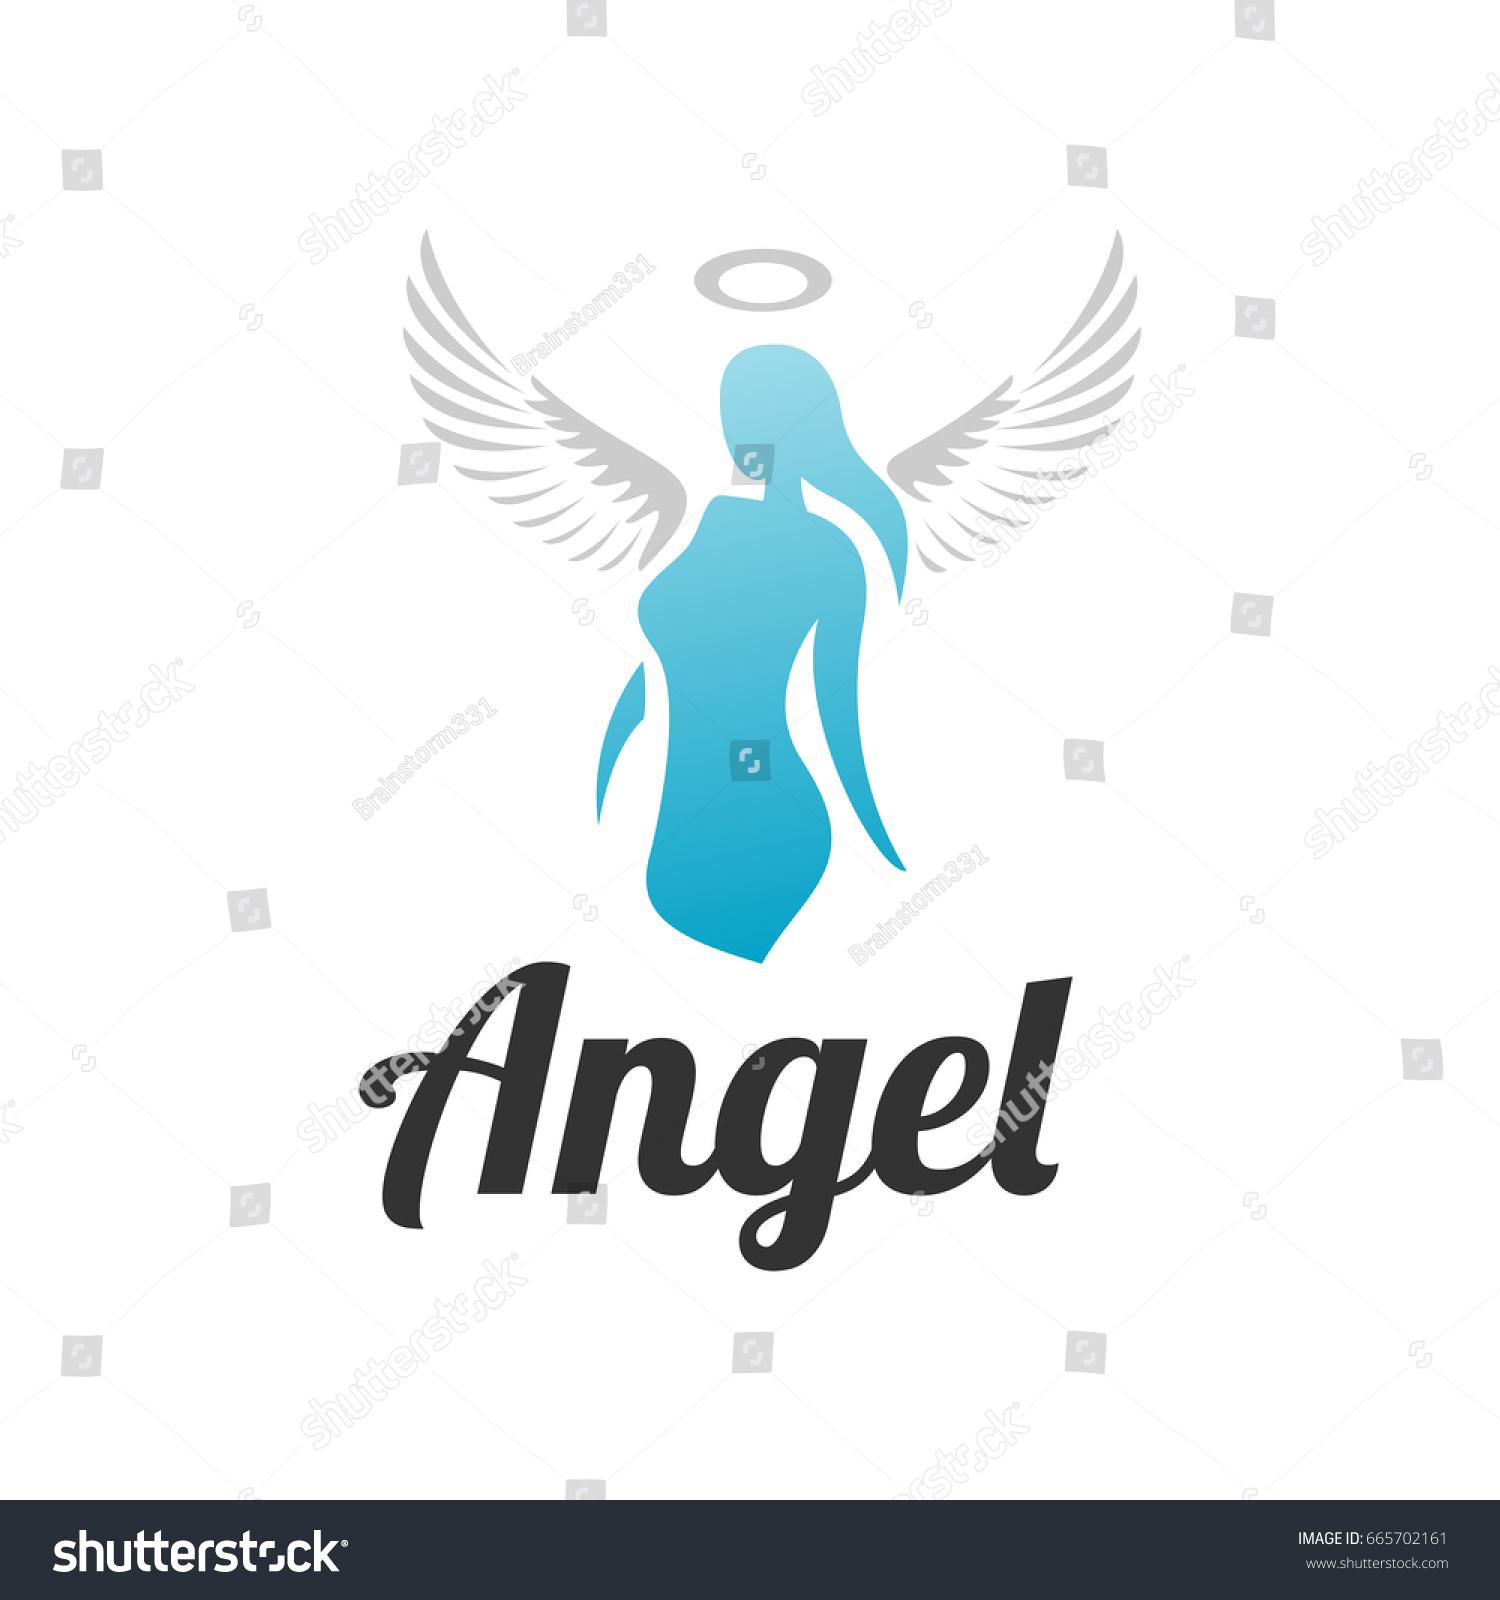 angel logo fitness icon cosmetics health stock vector 665702161 rh shutterstock com angel logo vector free angel logos and designs